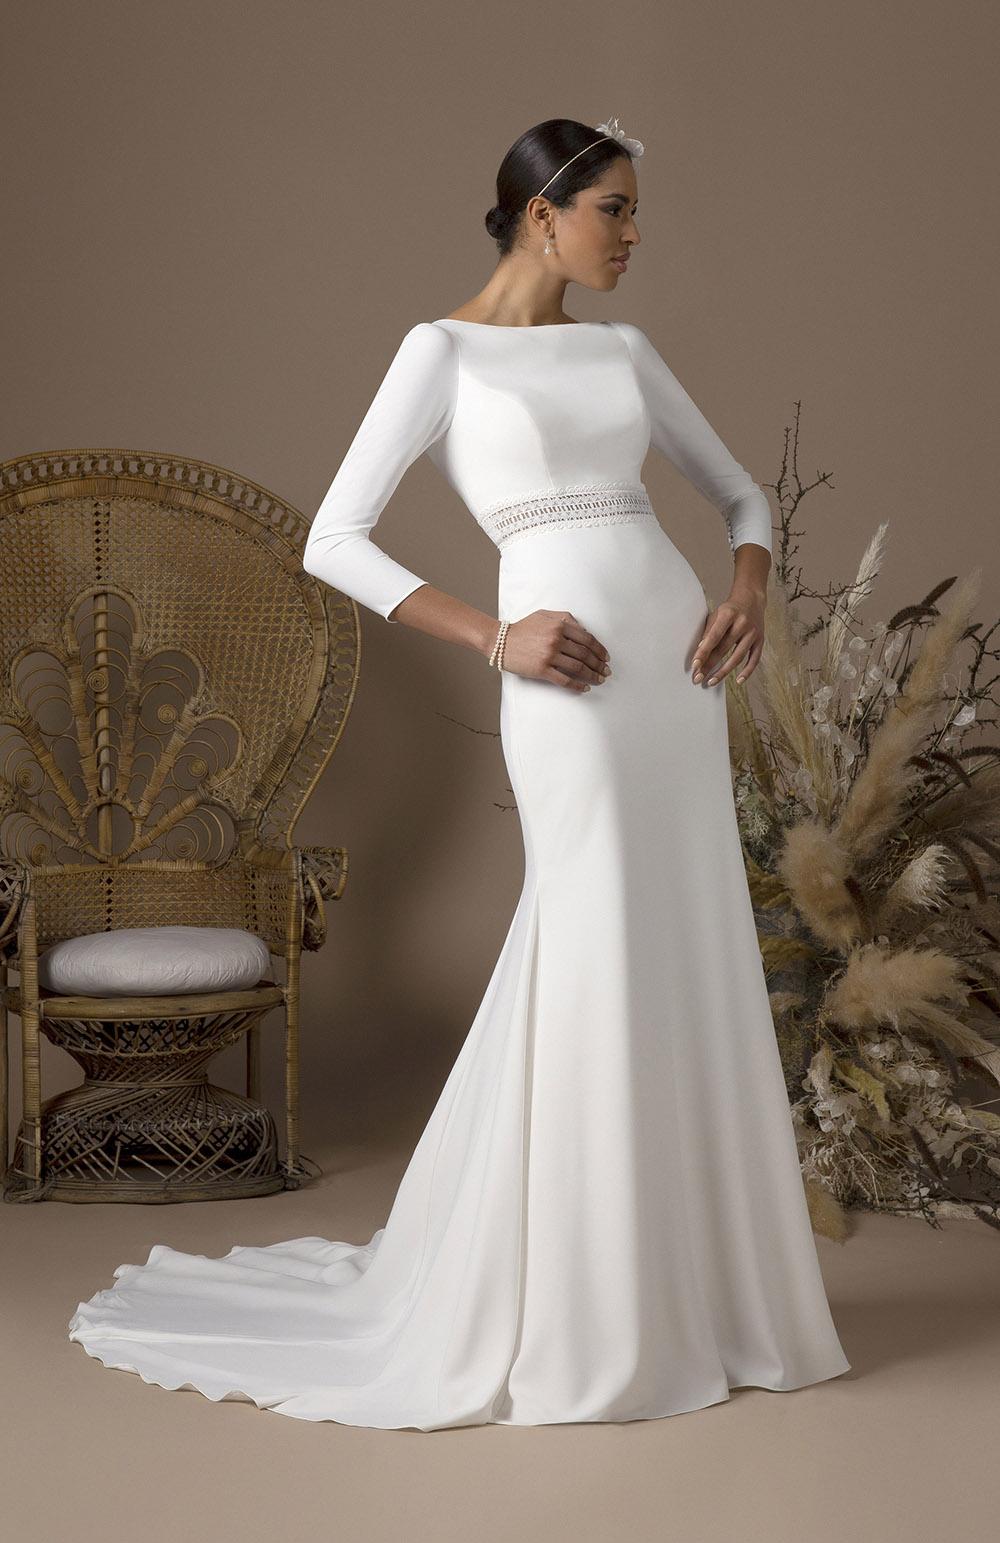 Robe de mariée Modèle Dolly